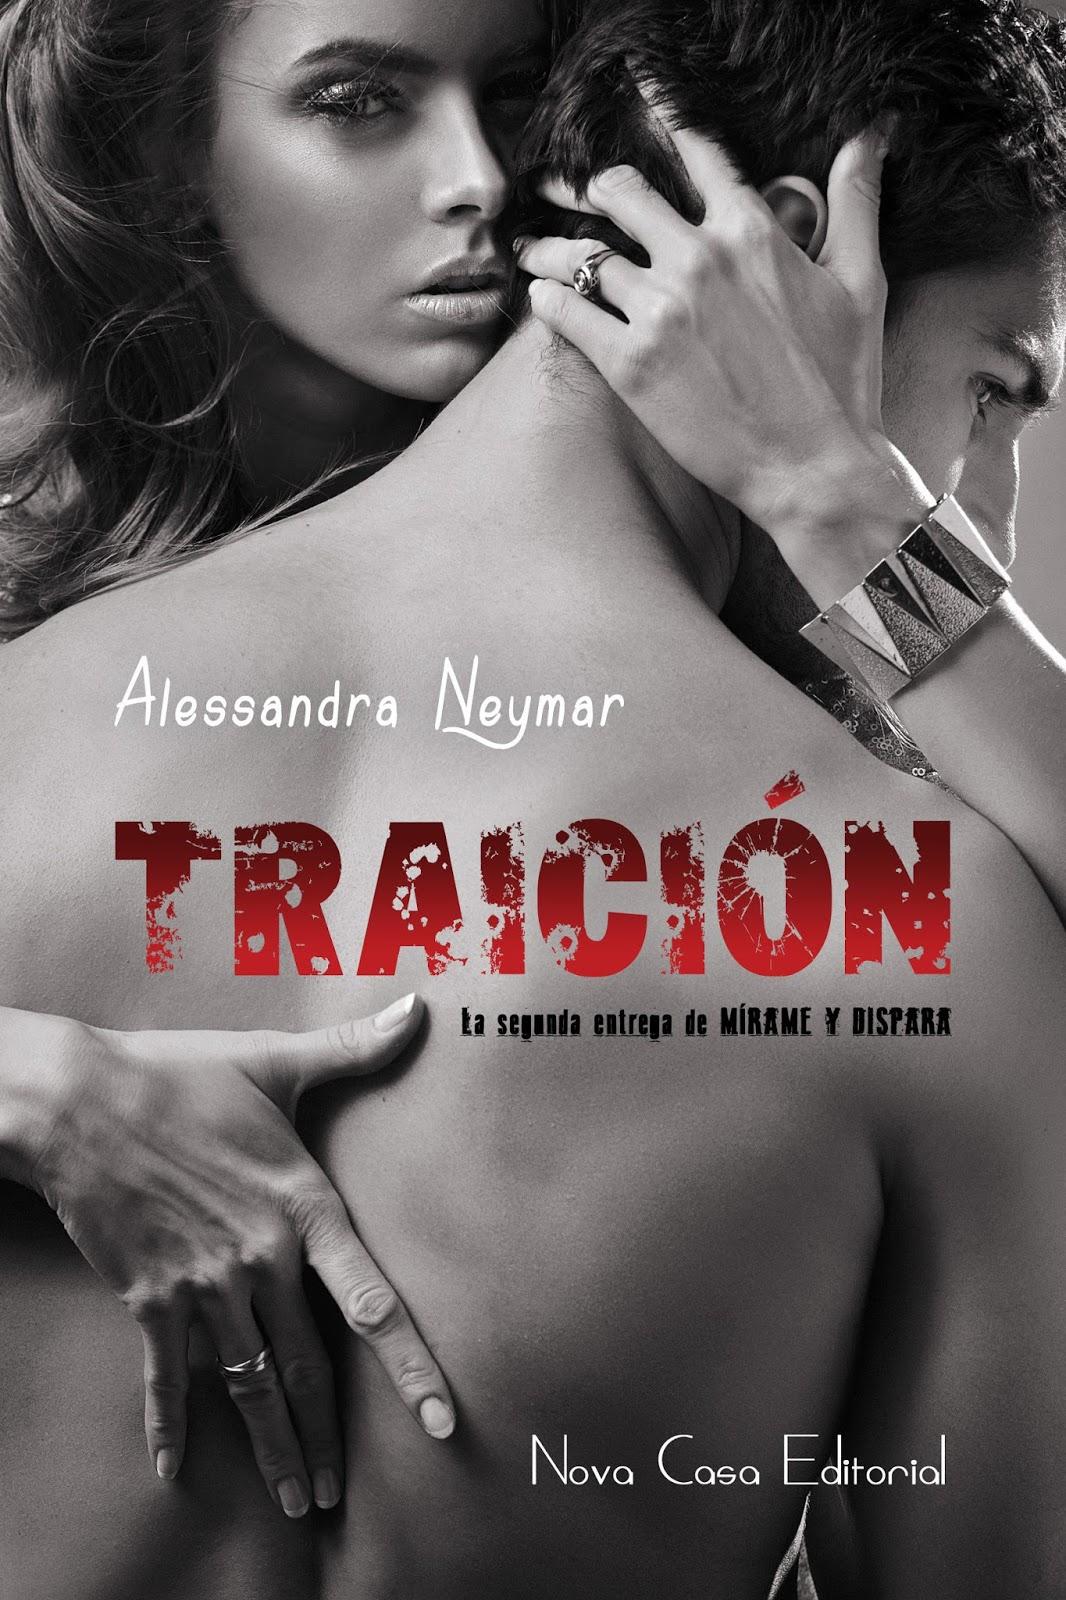 Alessandra neymar